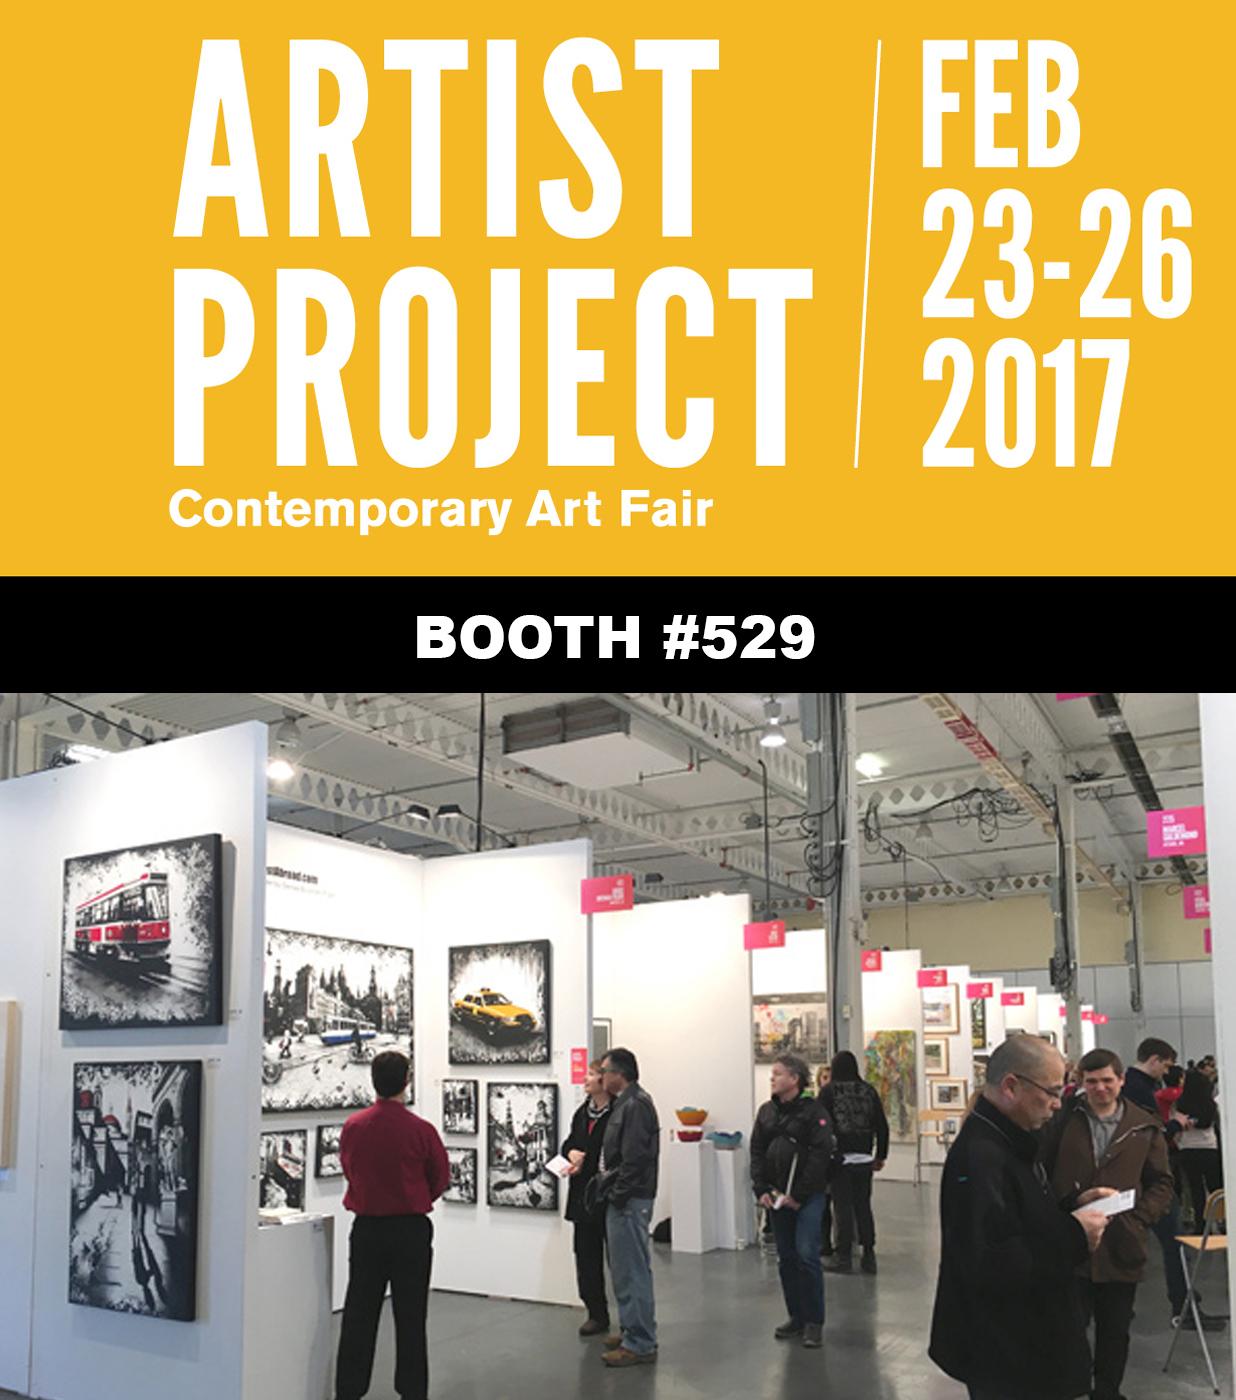 ArtistProject2017_Logo.jpg